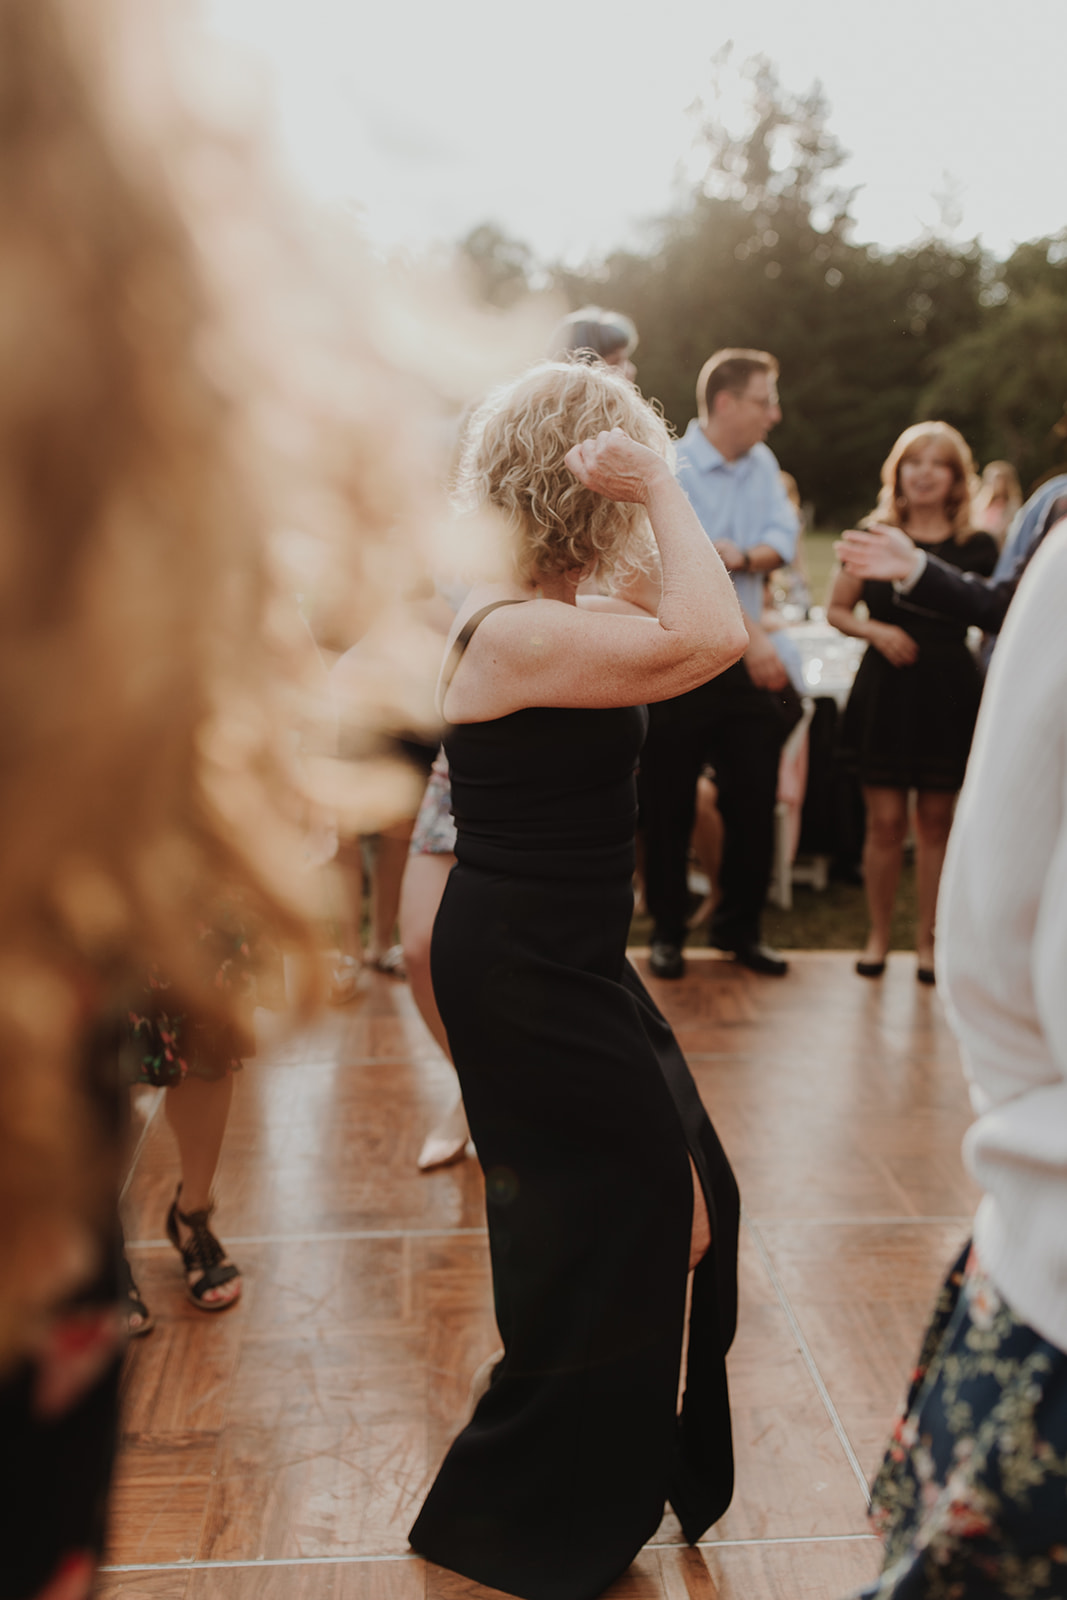 cortney_skye_wedding_june2019-675.jpg